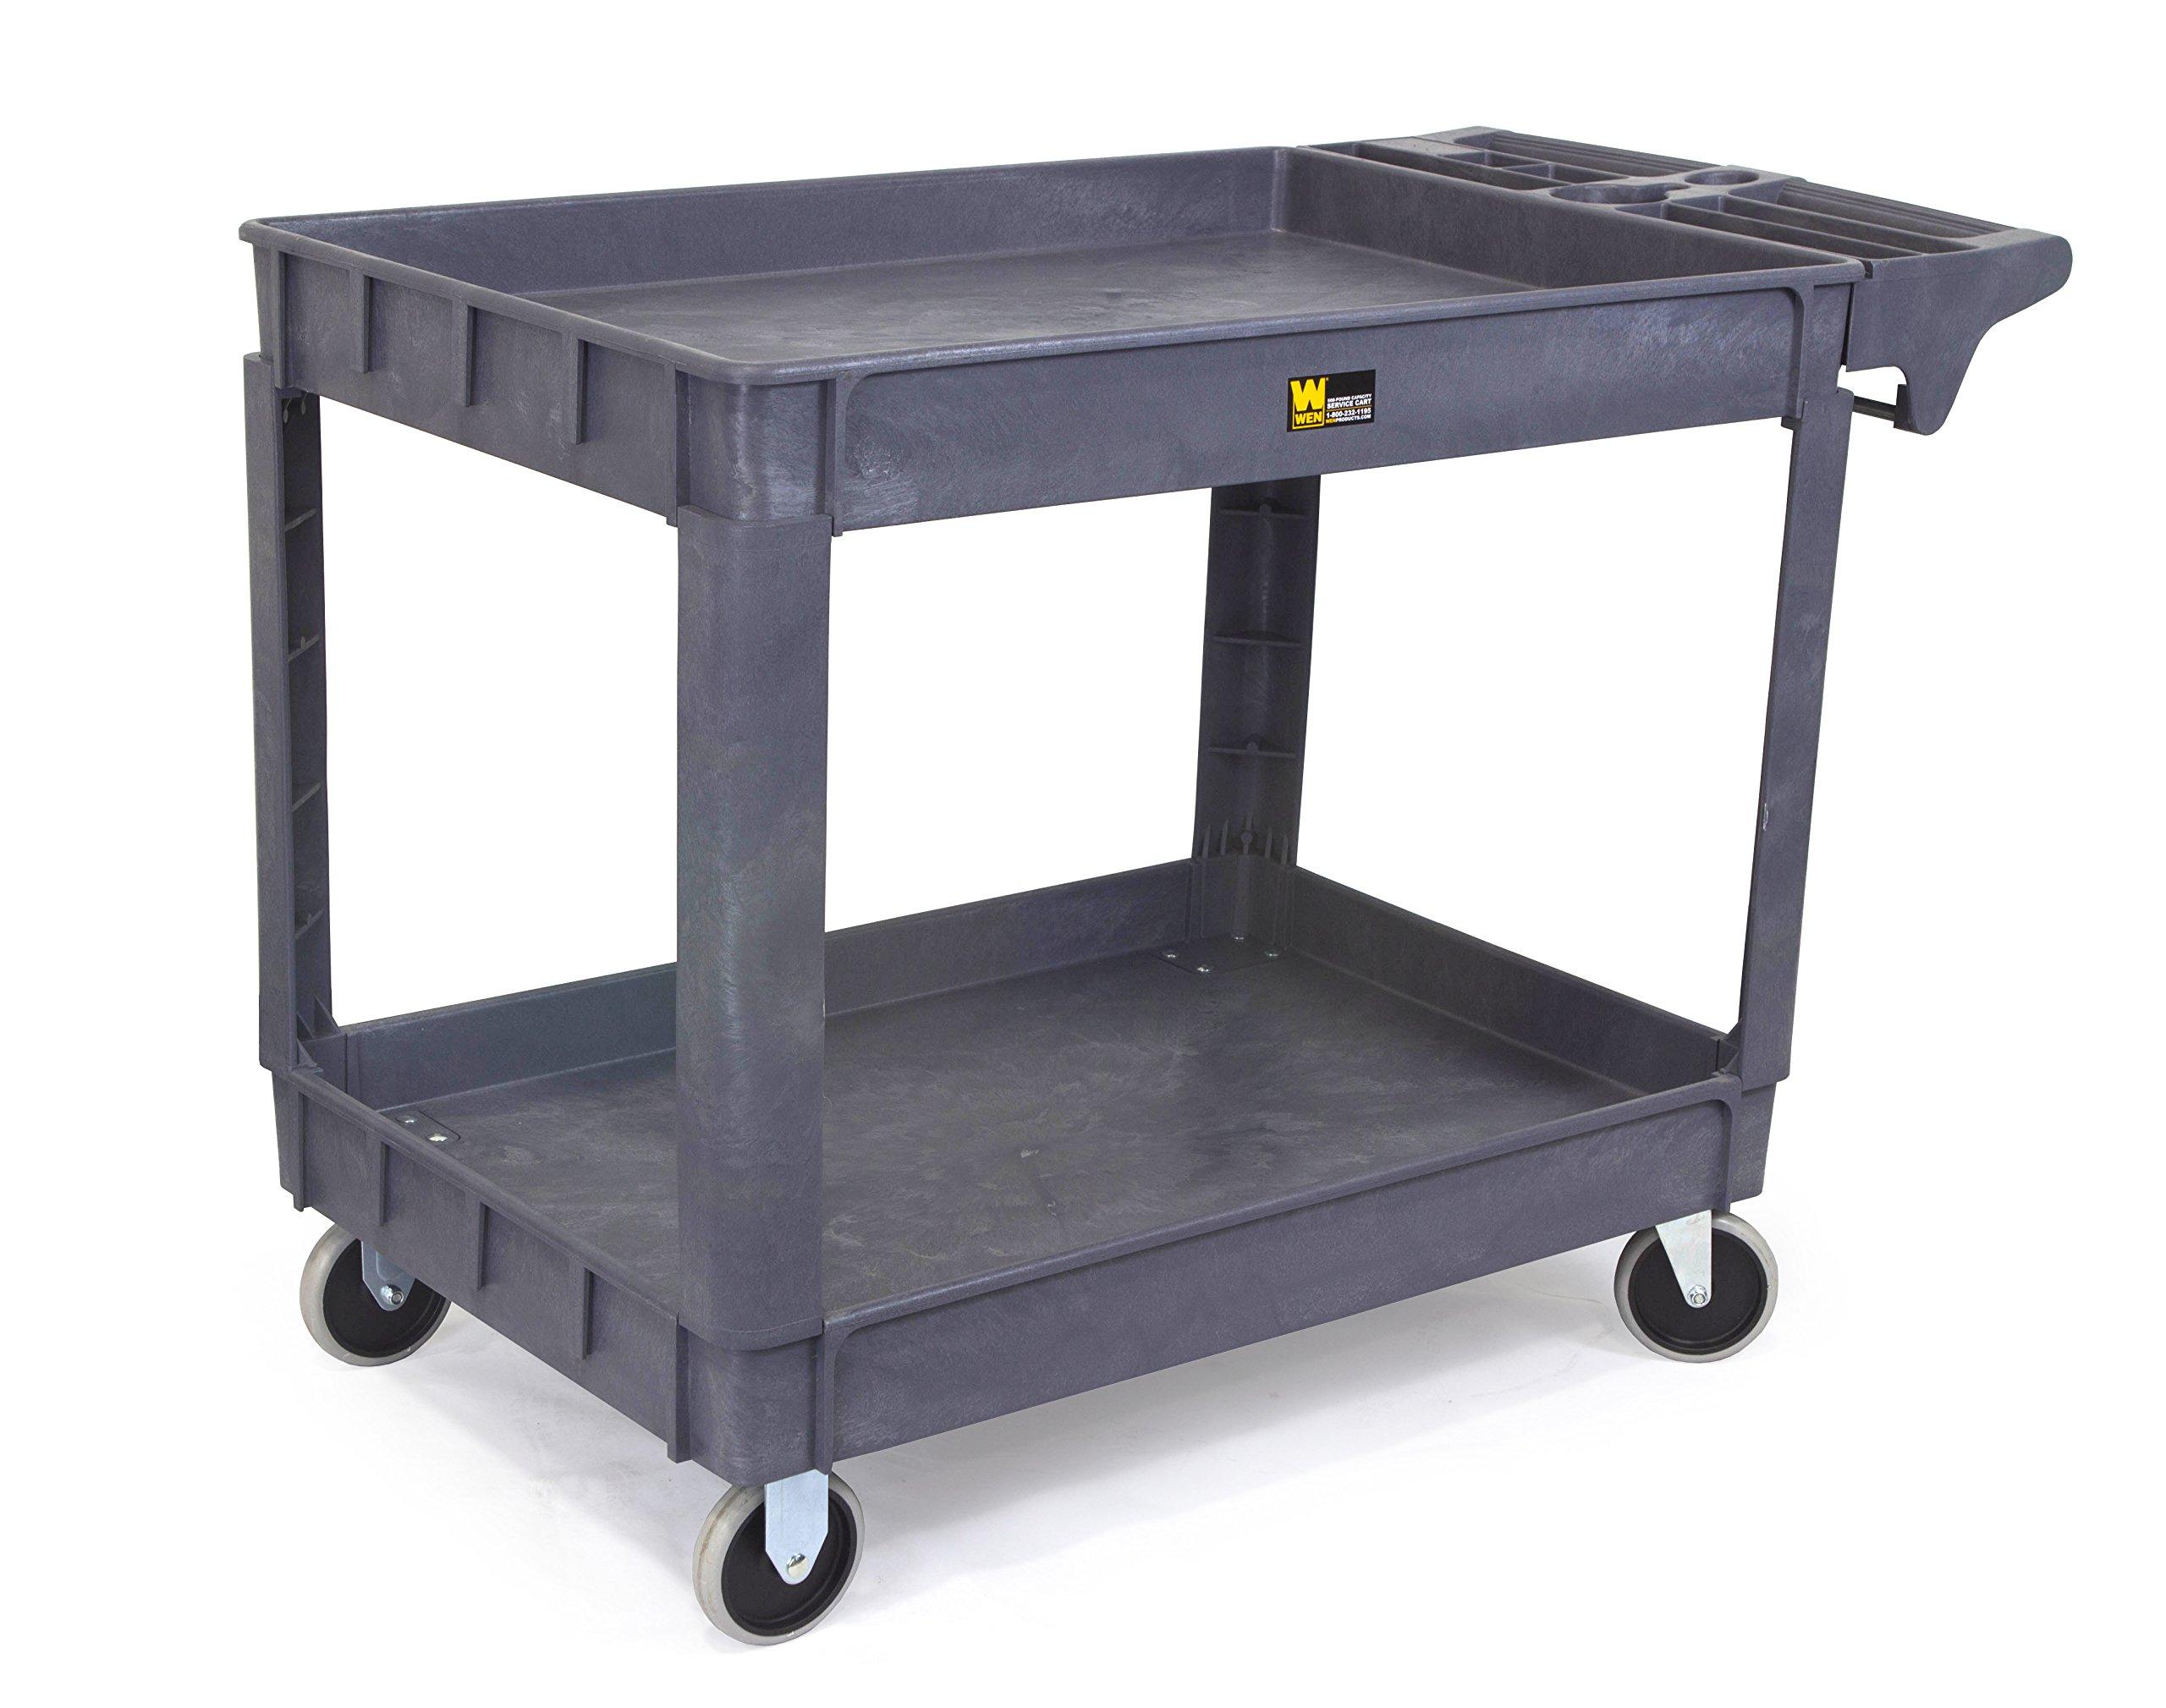 WEN 73004 500 lb Capacity Service Cart, X-Large by WEN